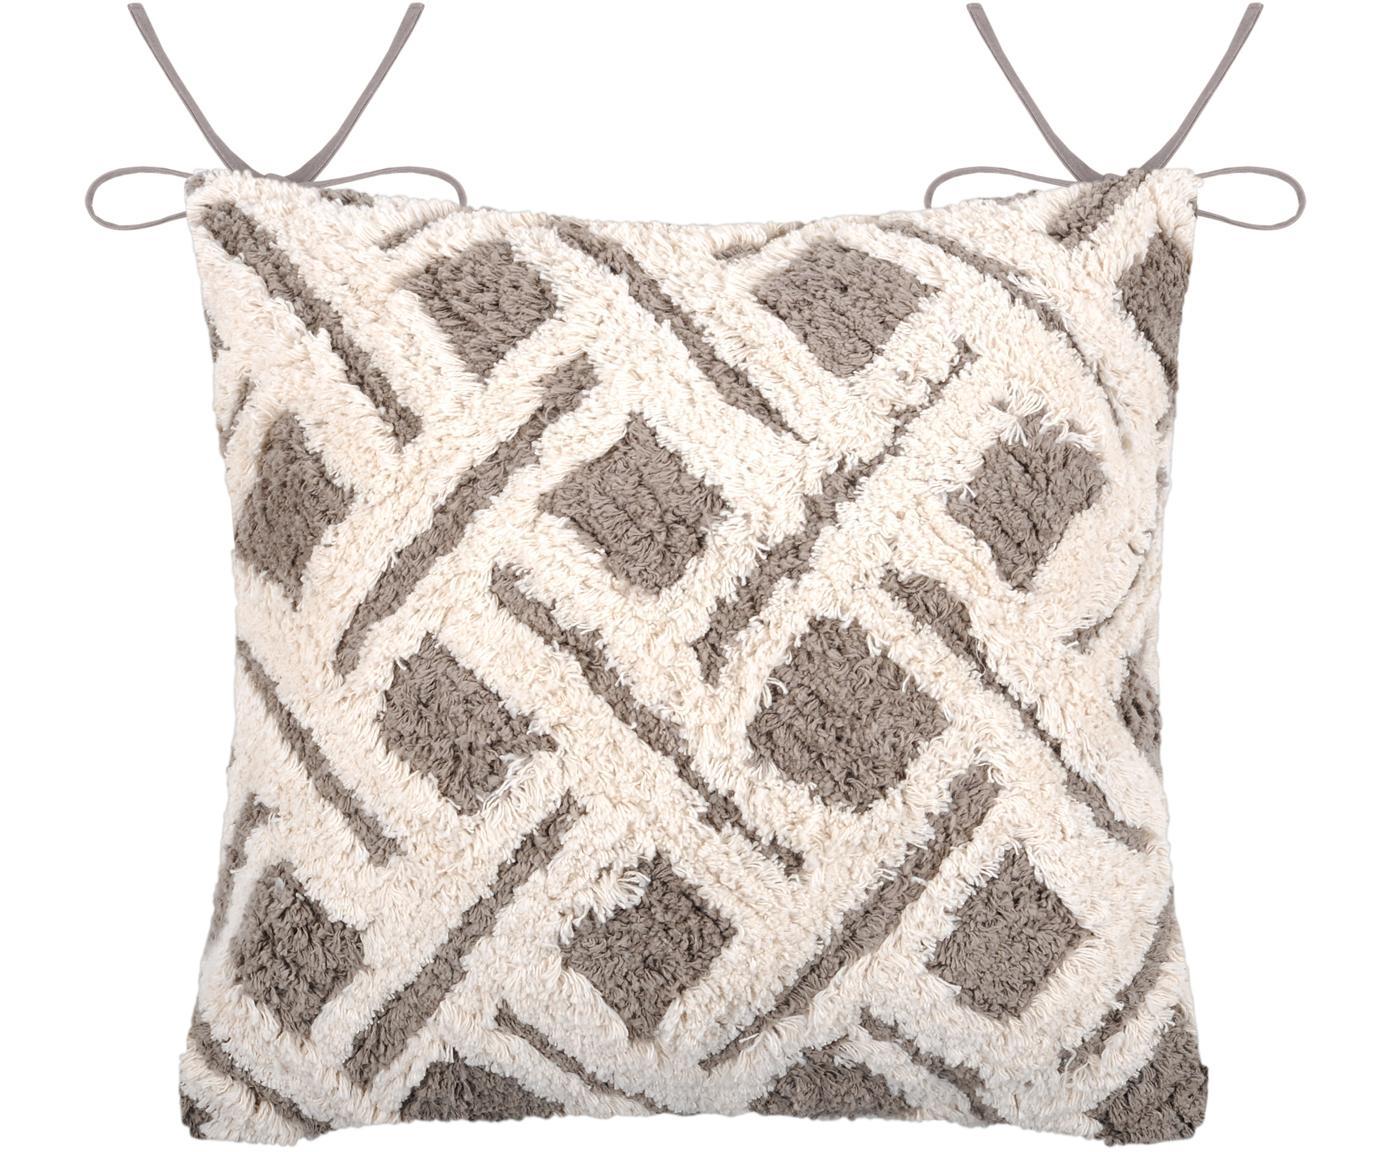 Cuscino sedia boho Tarawa, Rivestimento: cotone, Grigio, bianco, taupe, Larg. 40 x Lung. 40 cm